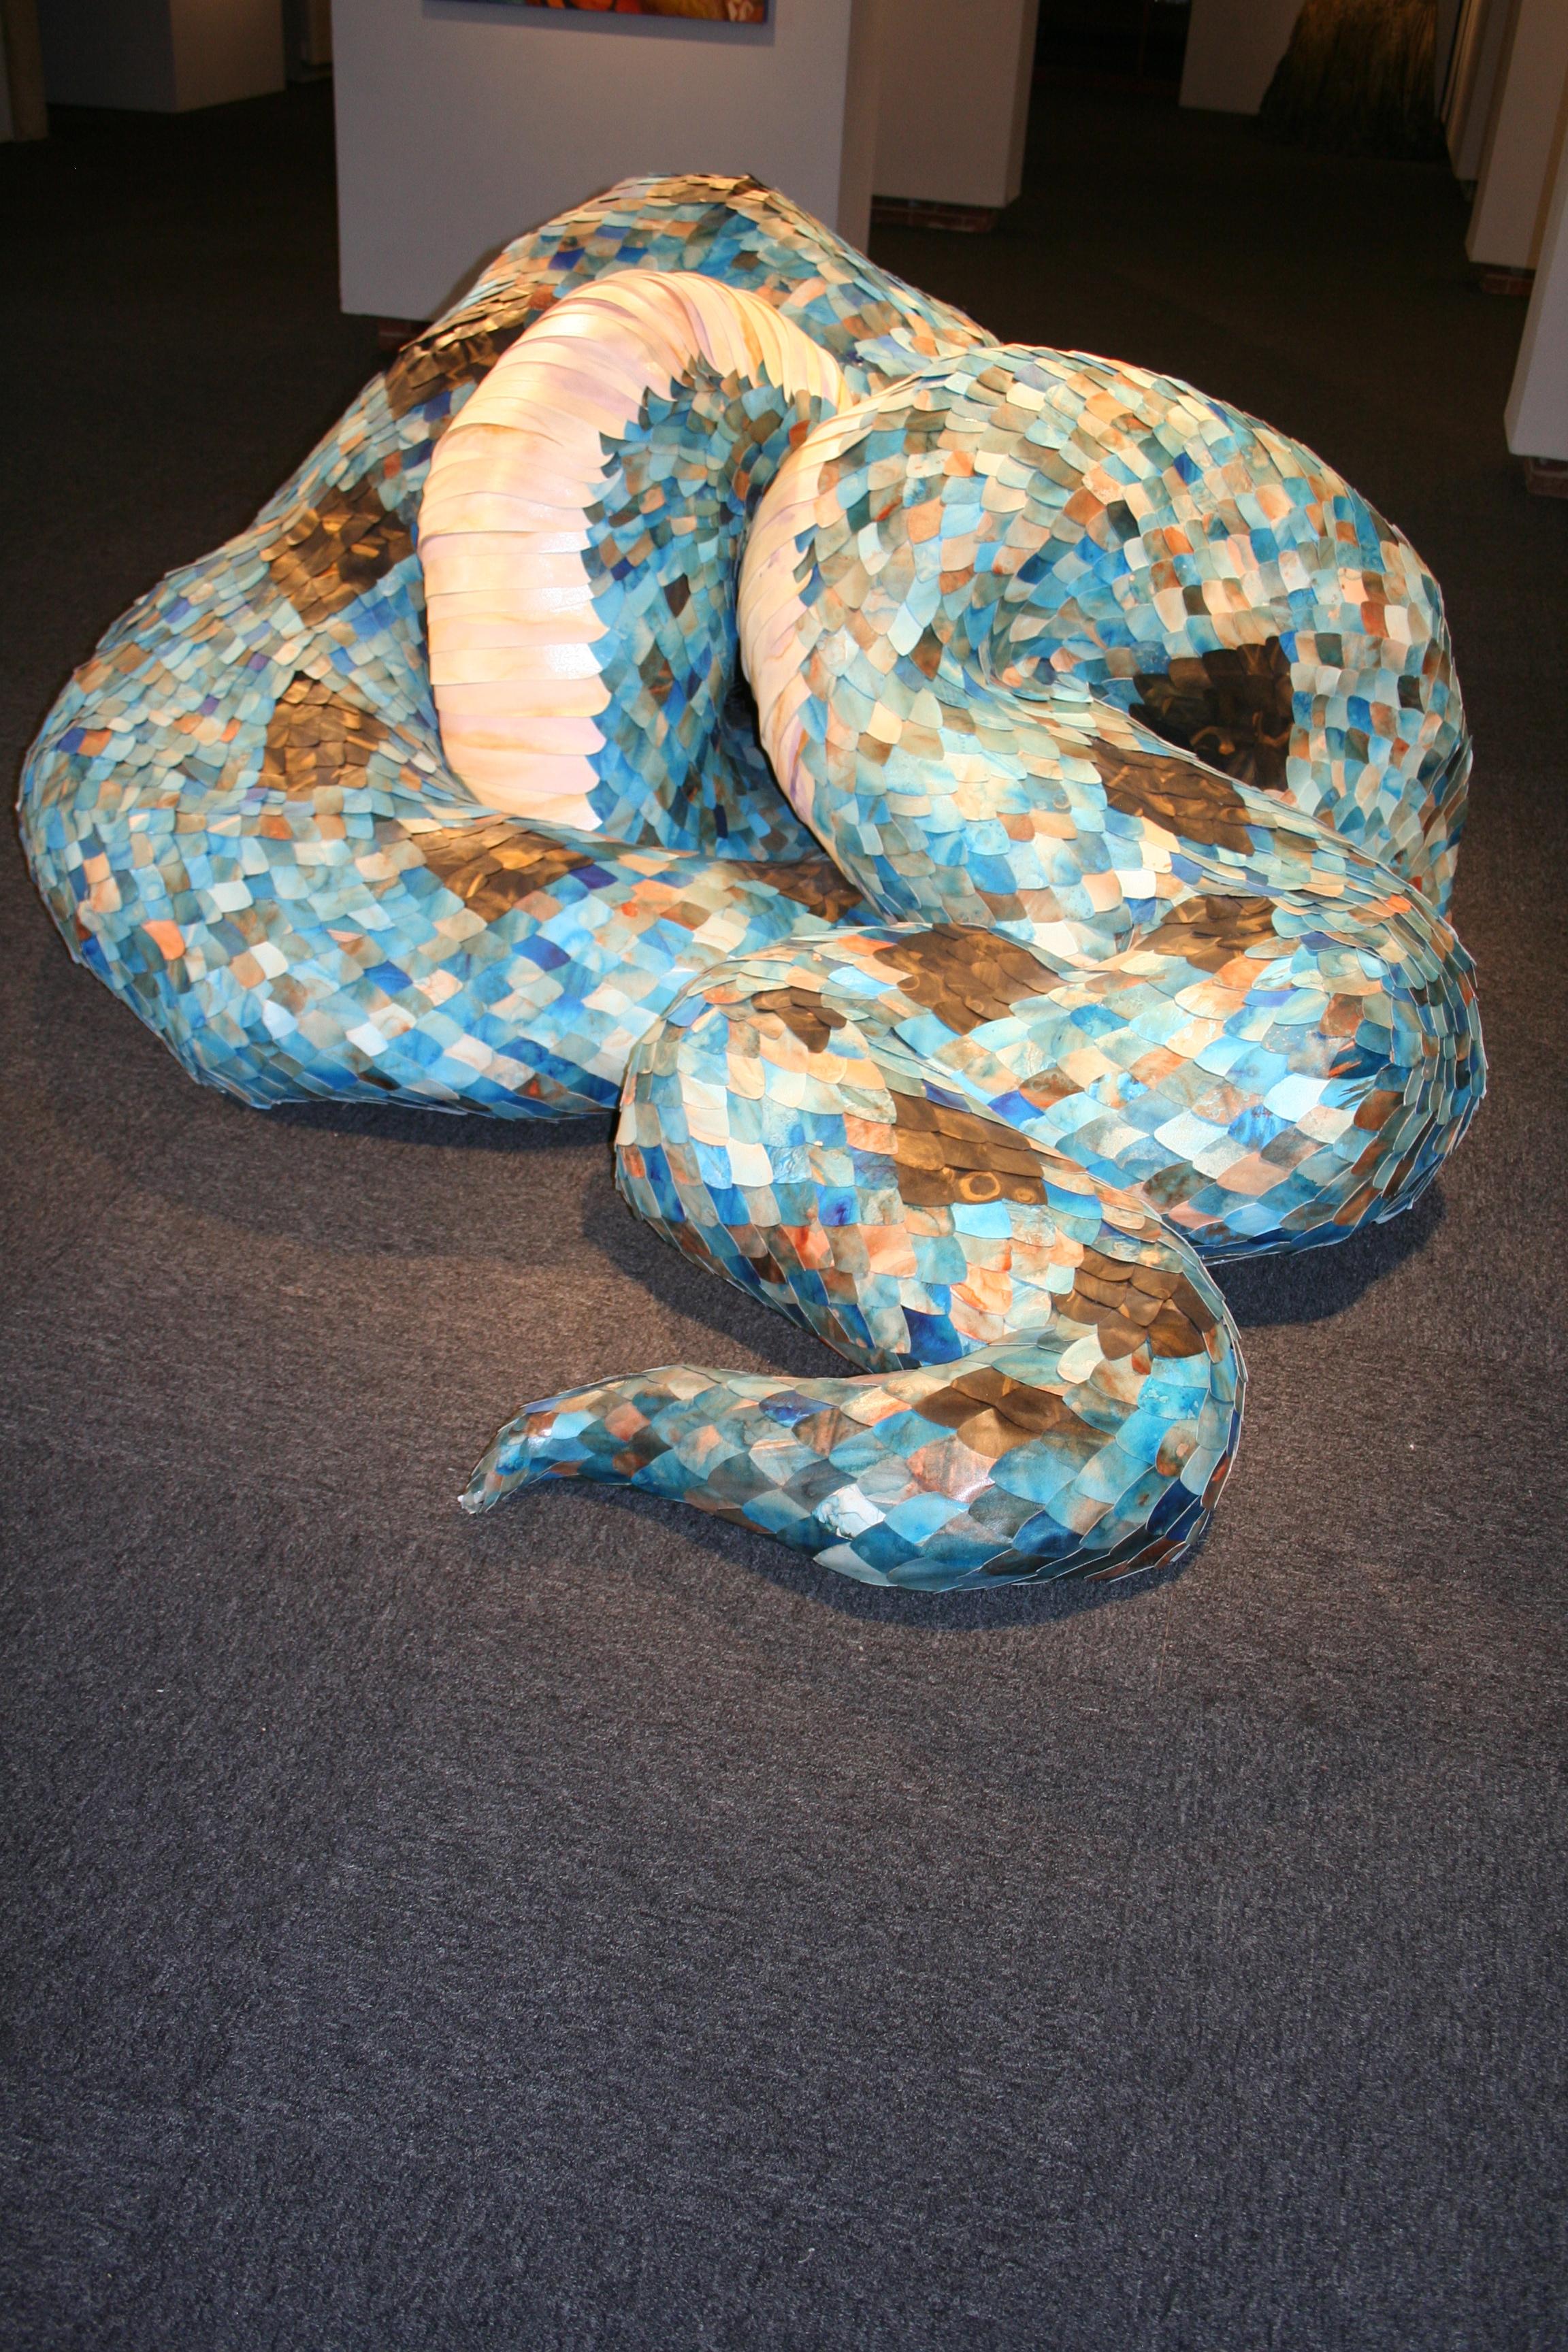 some sort of snake resembling sculpture